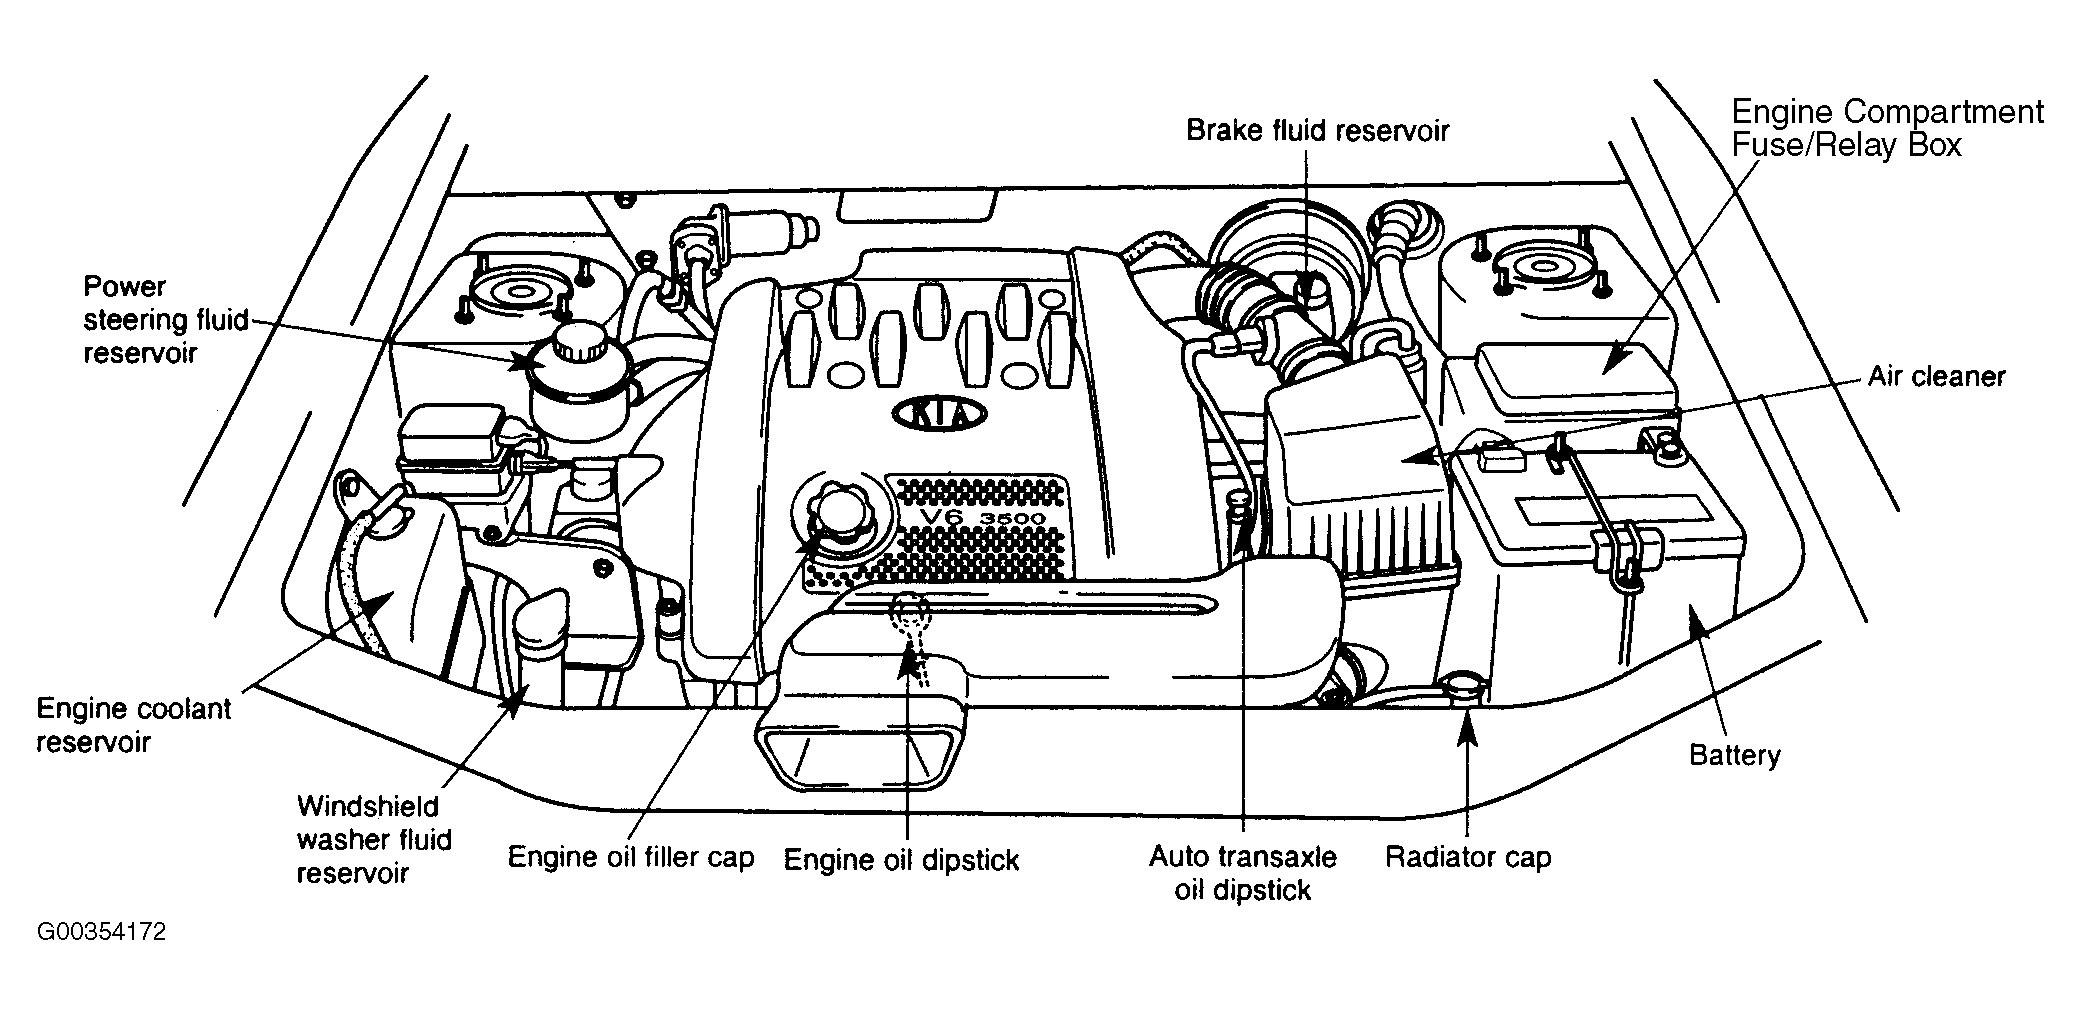 2004 Kia Spectra Fuse Box Wiring Diagram Snow Regular Snow Regular Bowlingronta It